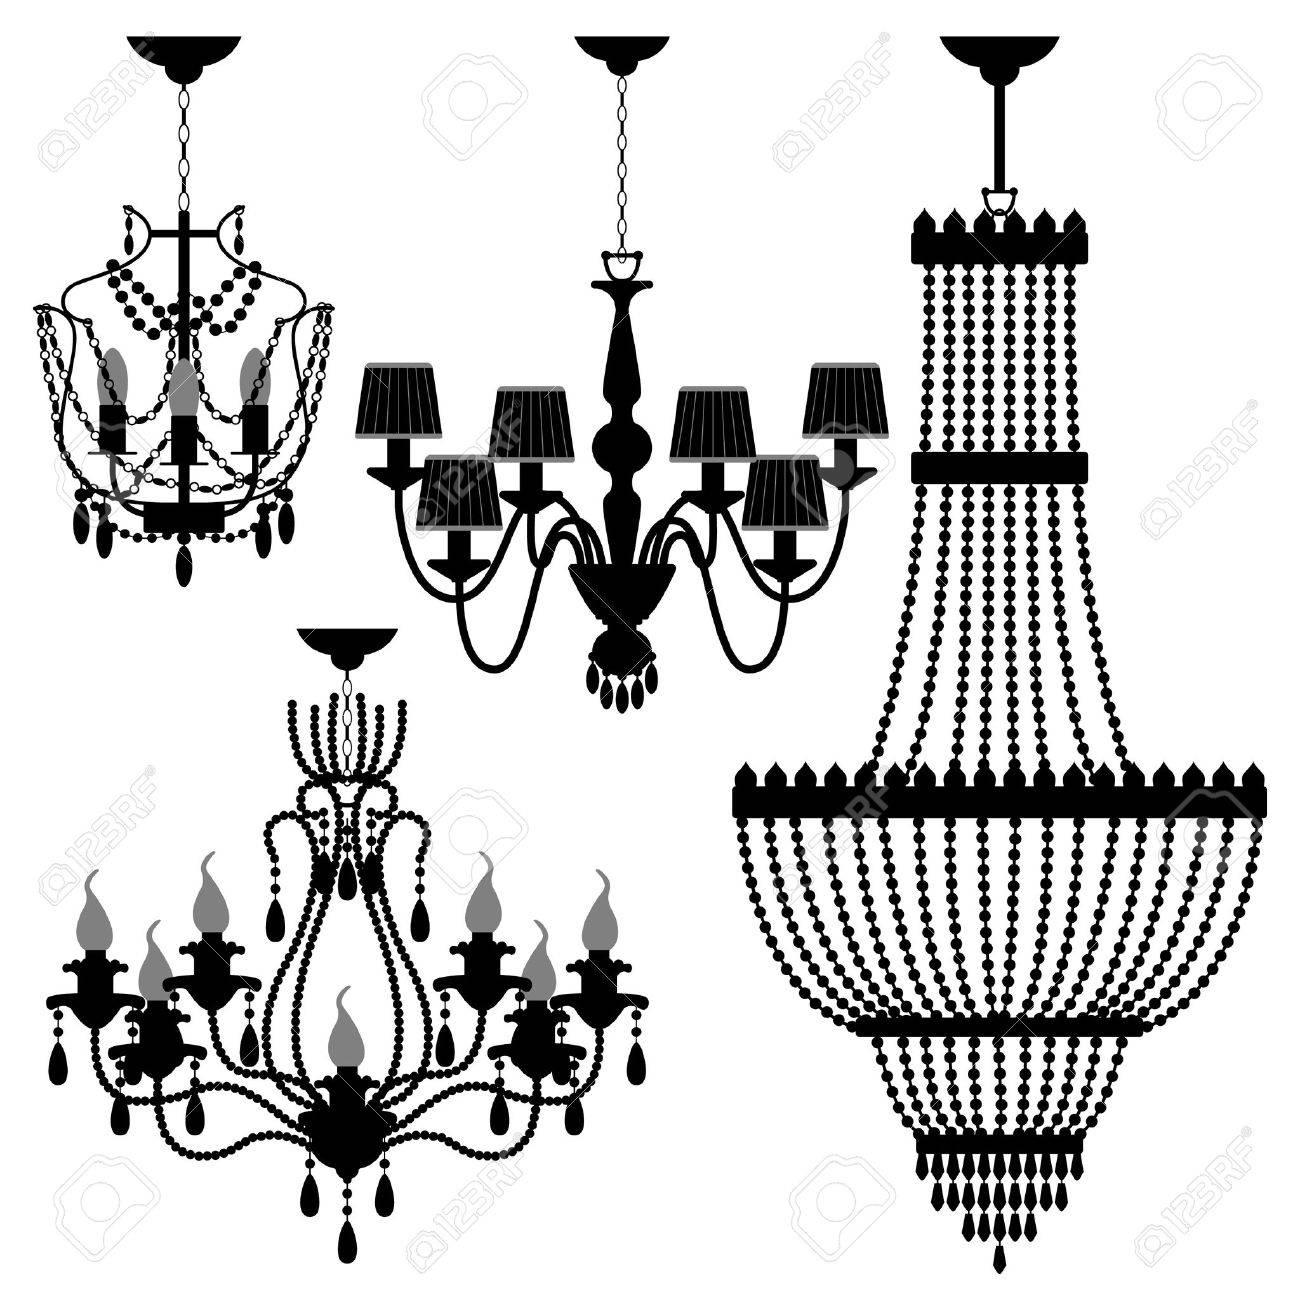 Chandelier black silhouette royalty free cliparts vectors and chandelier black silhouette stock vector 8723514 arubaitofo Gallery